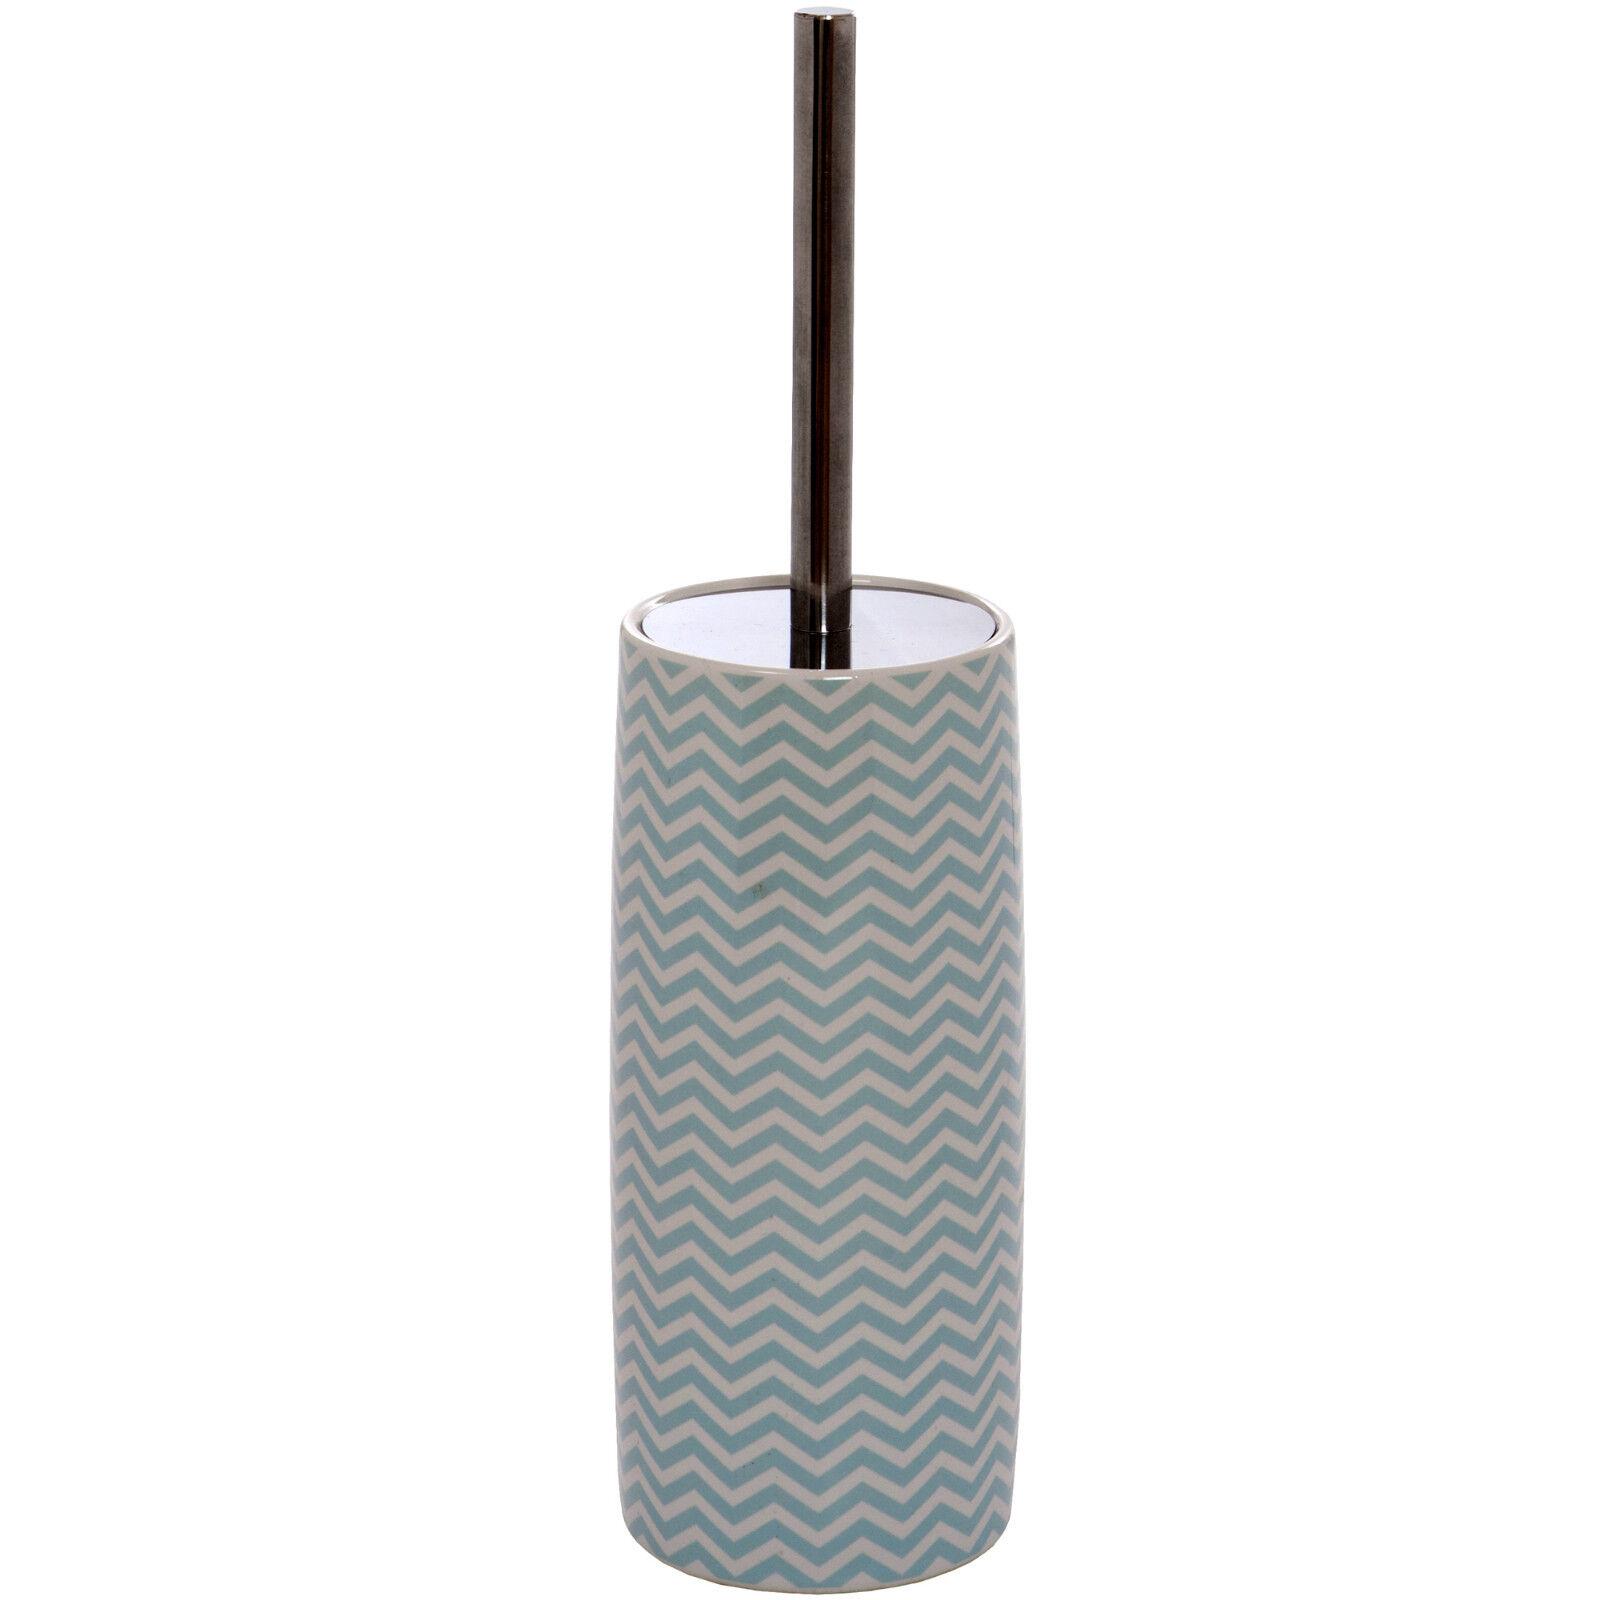 ceramic toilet brush and holder set white turquoise chrome bathroom ebay. Black Bedroom Furniture Sets. Home Design Ideas